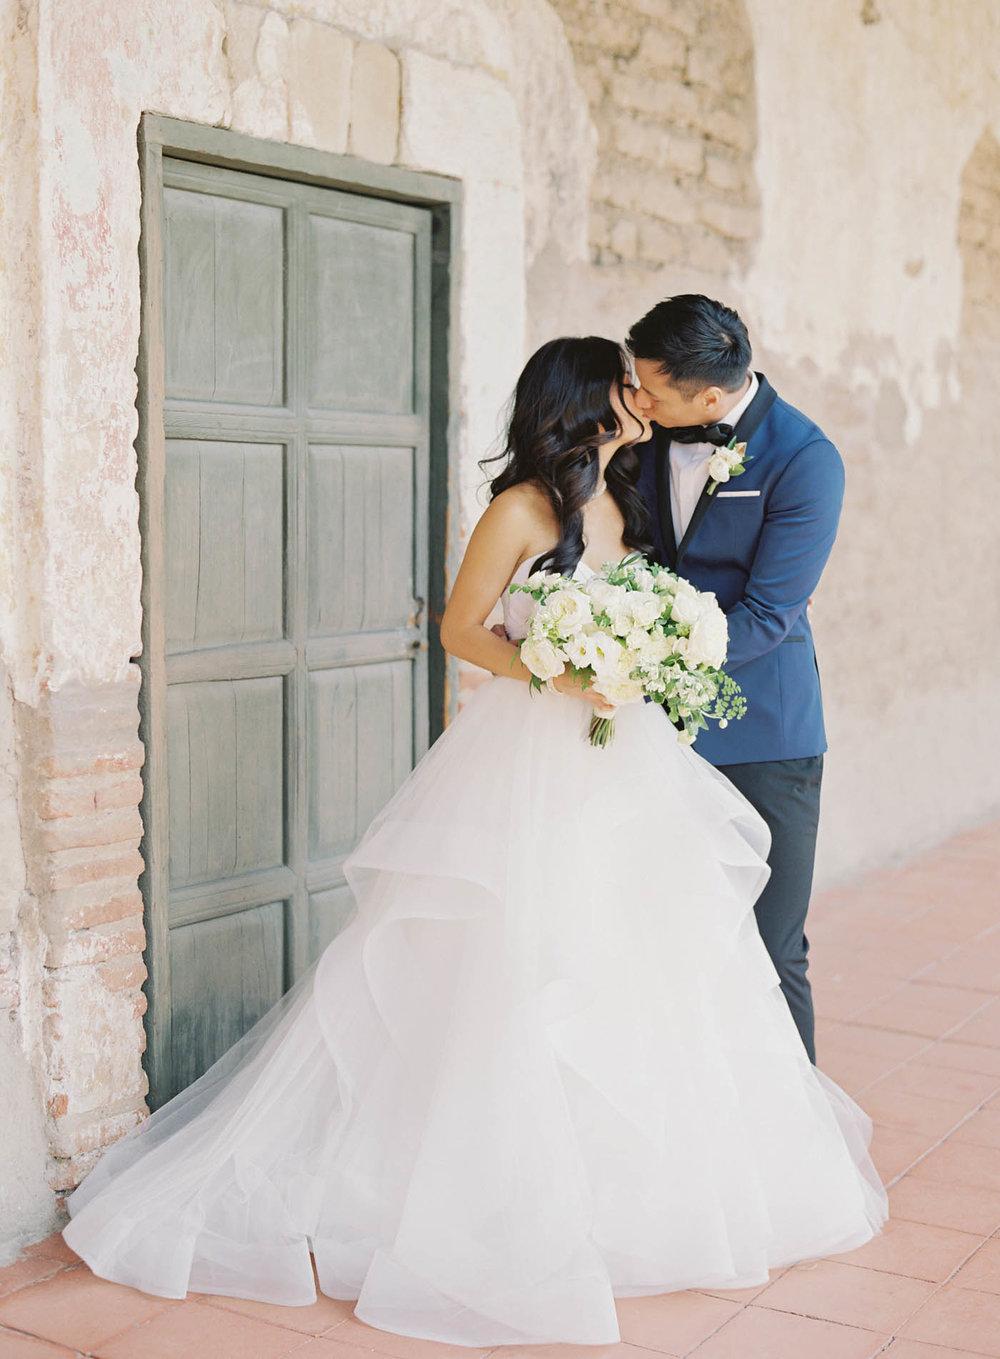 franciscan-gardens-wedding-8-Jen_Huang-000749-R1-013.jpg